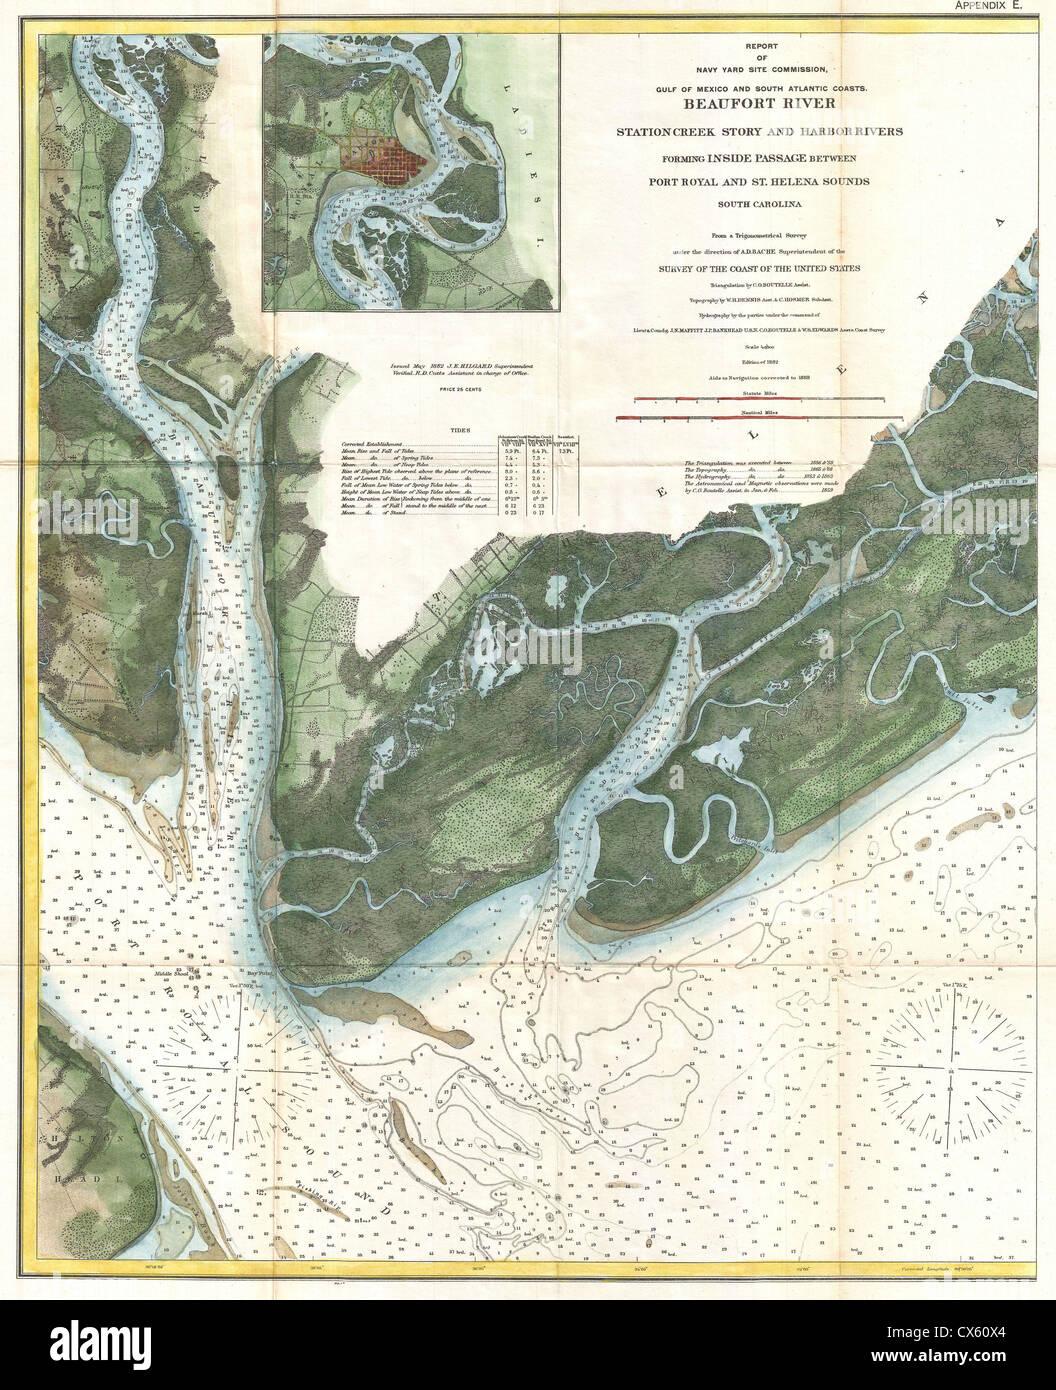 Coast Of South Carolina Map.1882 U S Coast Survey Map Of Beaufort South Carolina Stock Photo